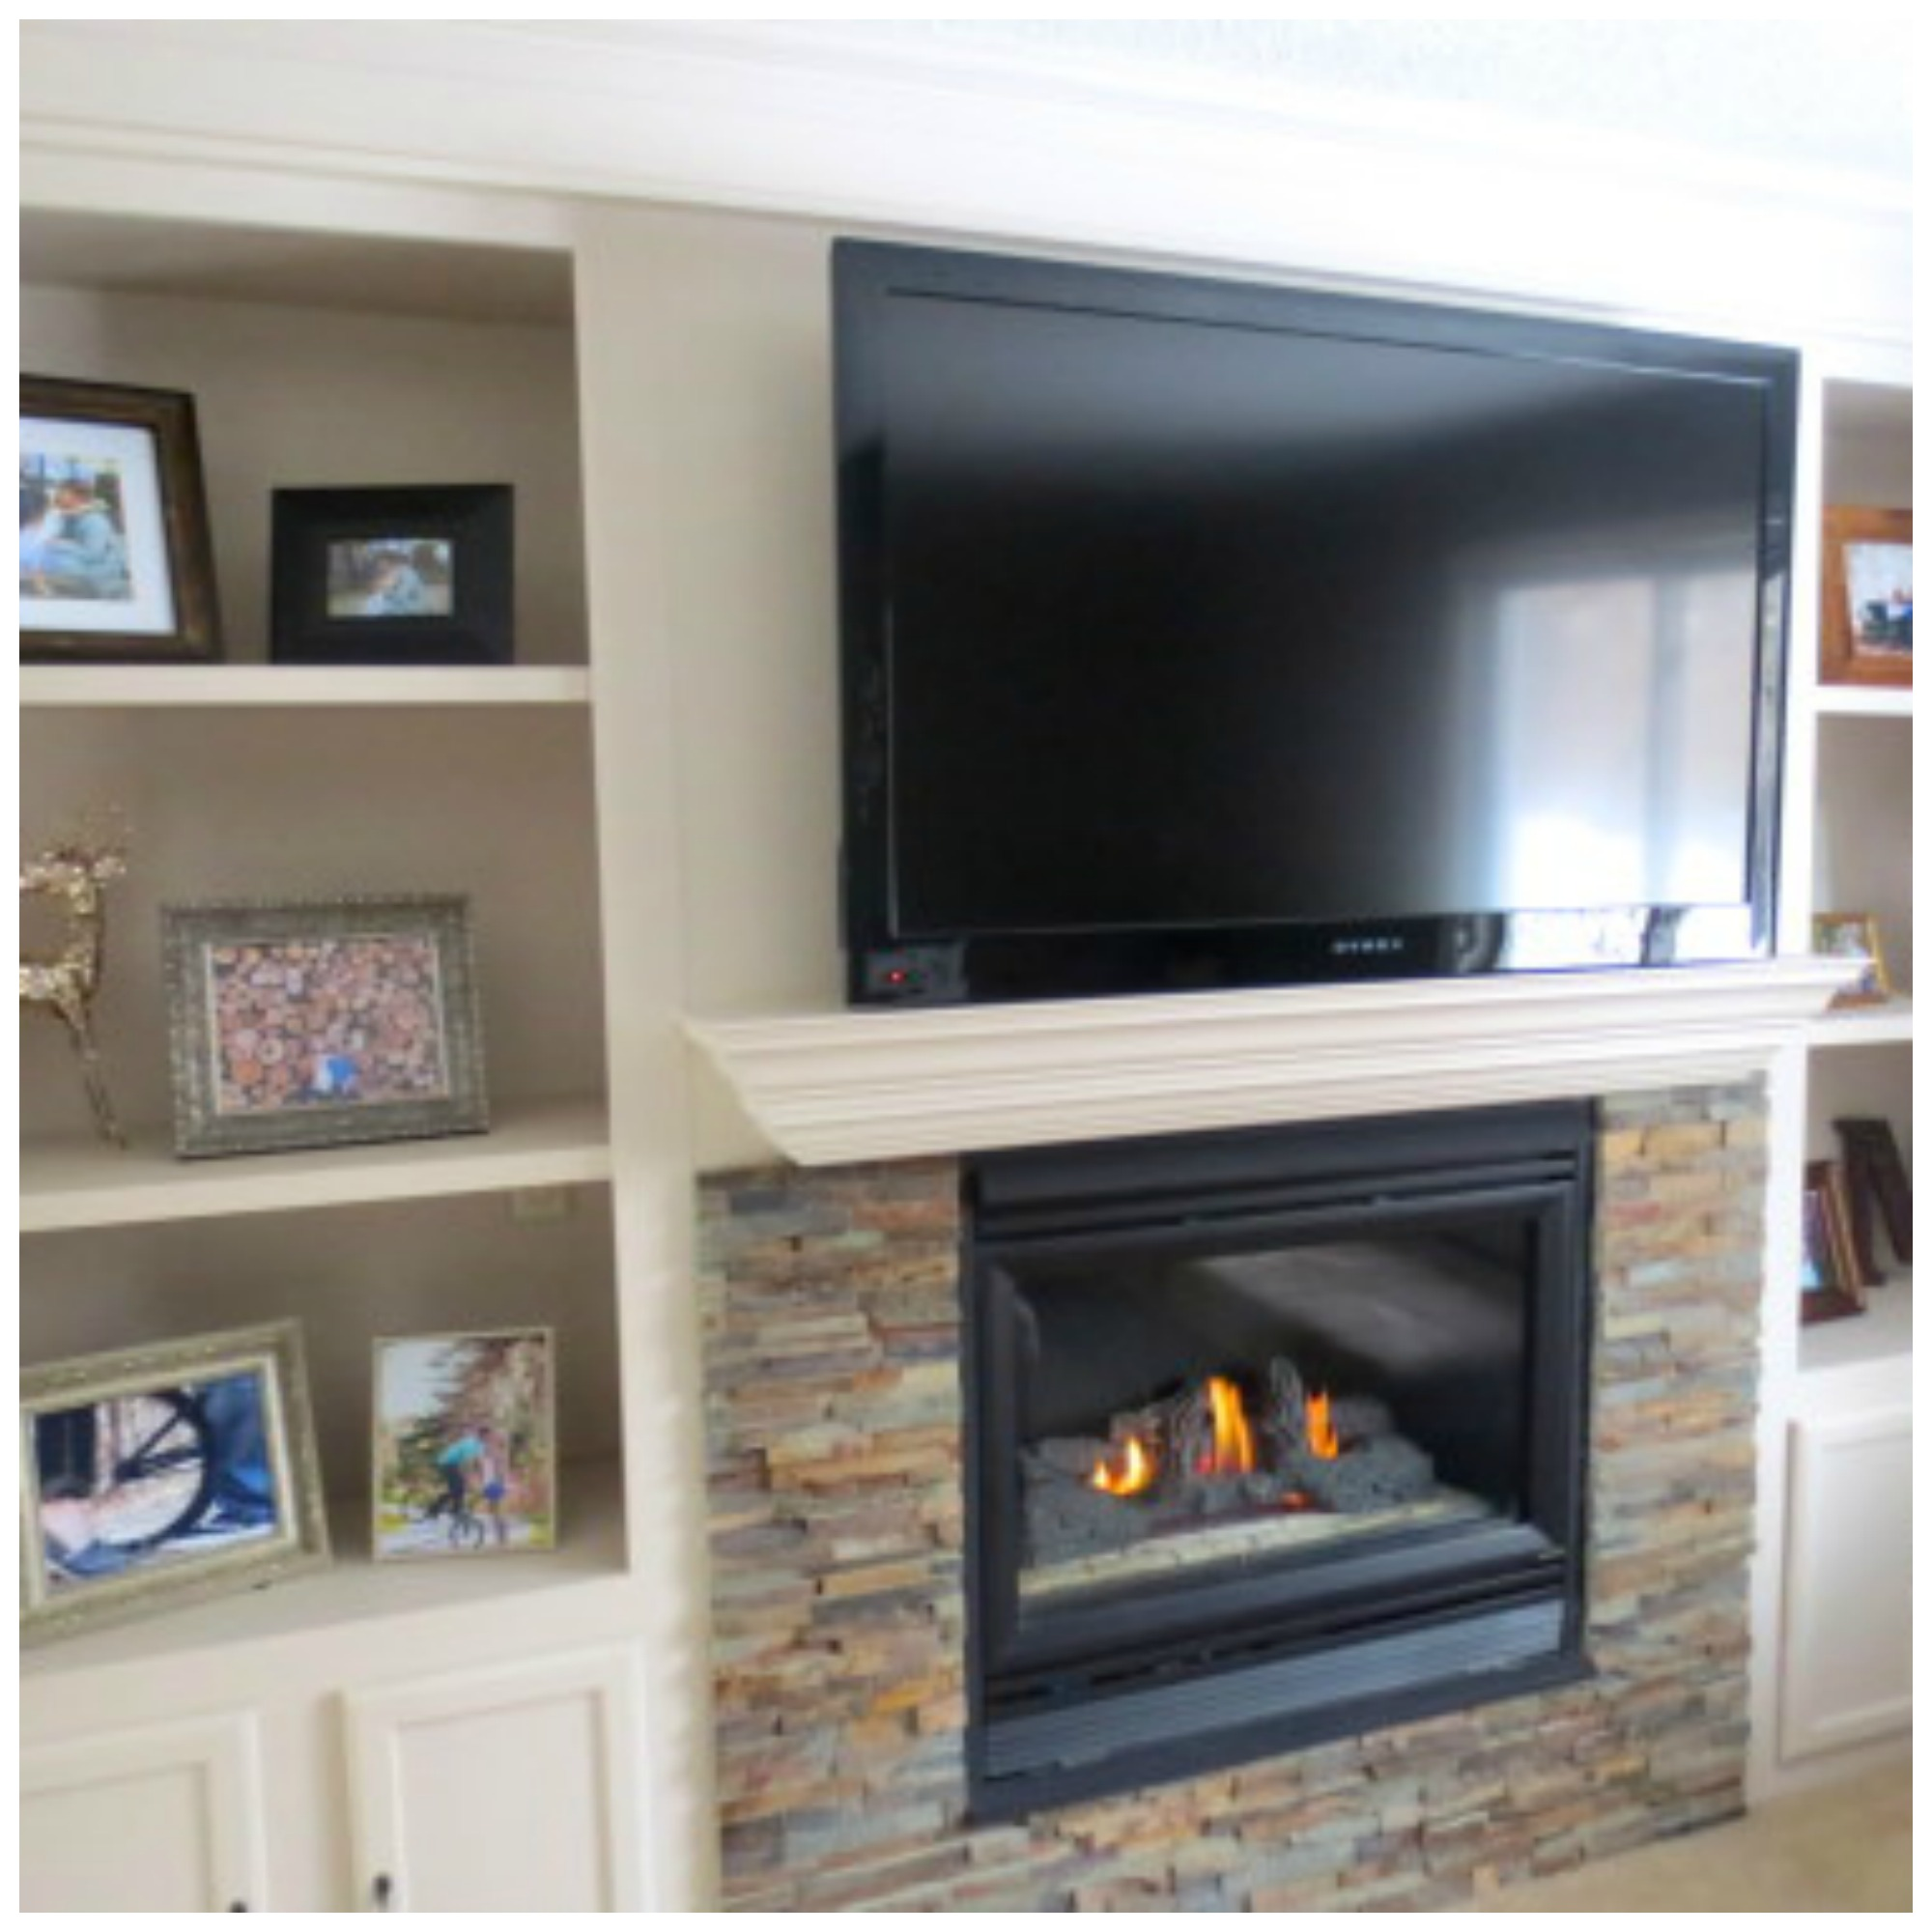 guest blog post u2013 fireplace remodel u2013 nadeau u2013 blog with a soul